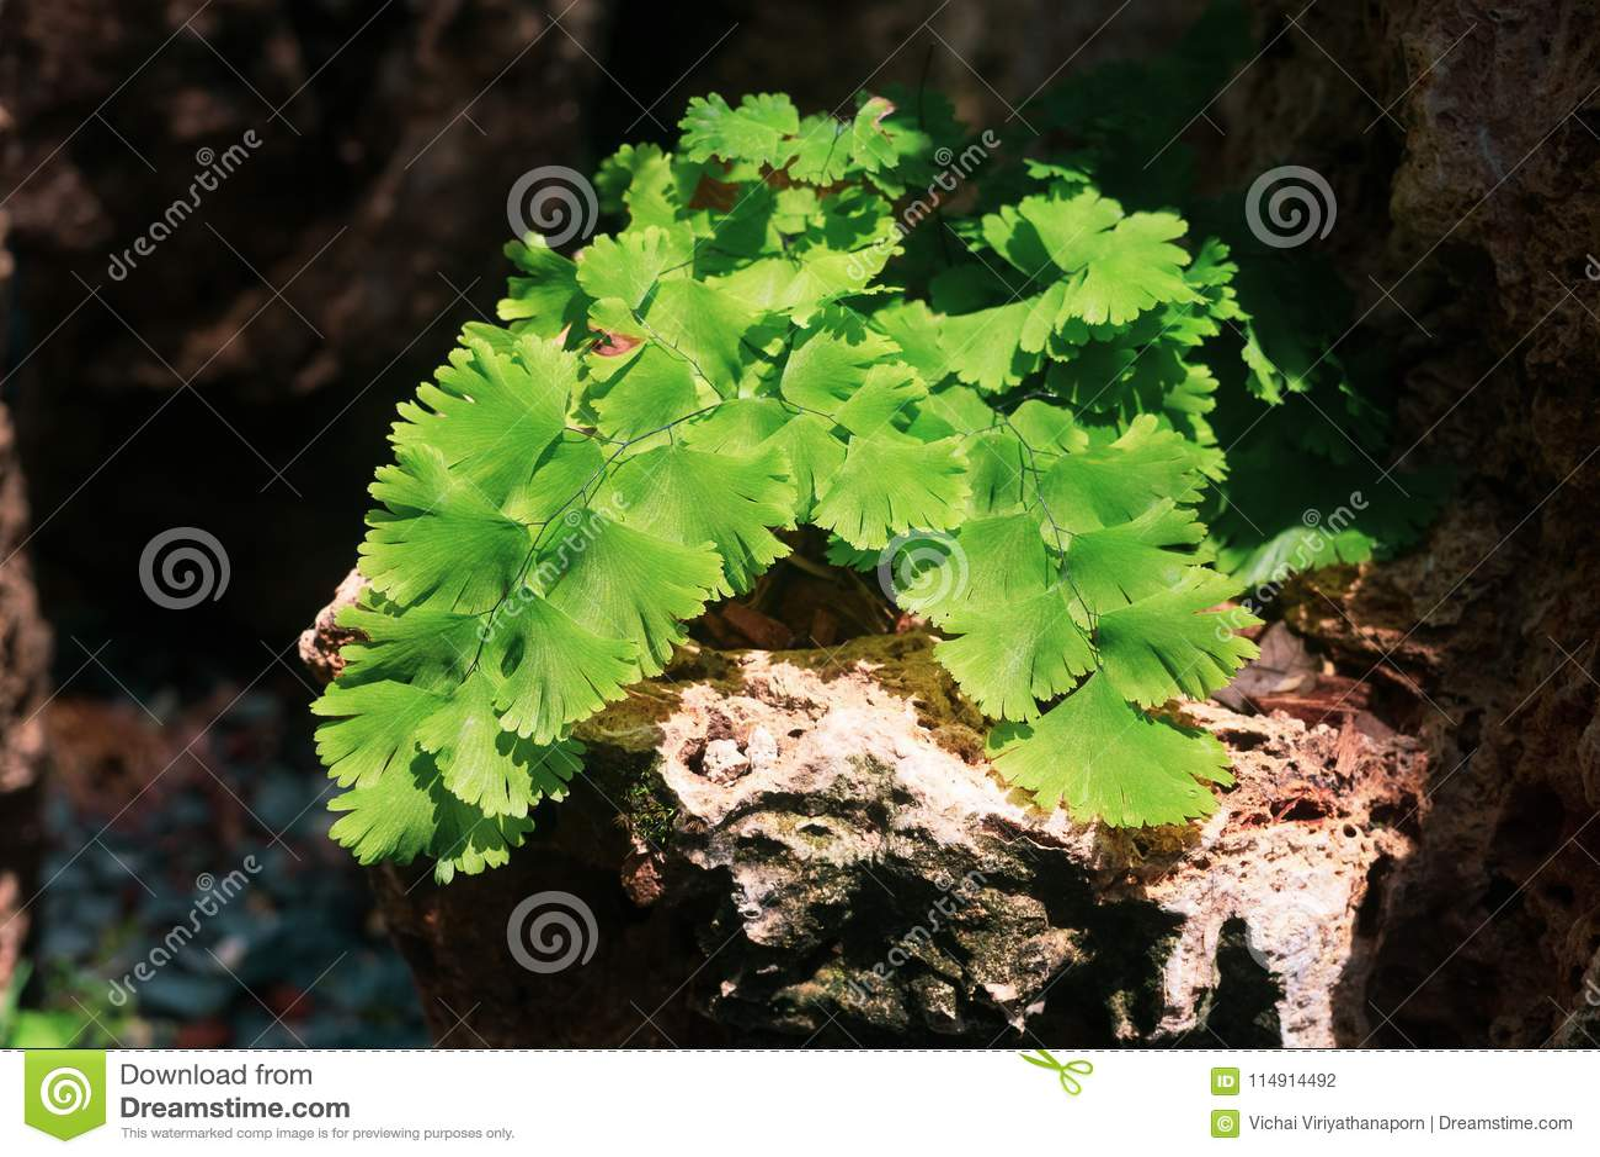 Adiantum capillus veneris or Southern Black Maidenhair fern. Close up of cute small green fern decoration in the tropical garden.